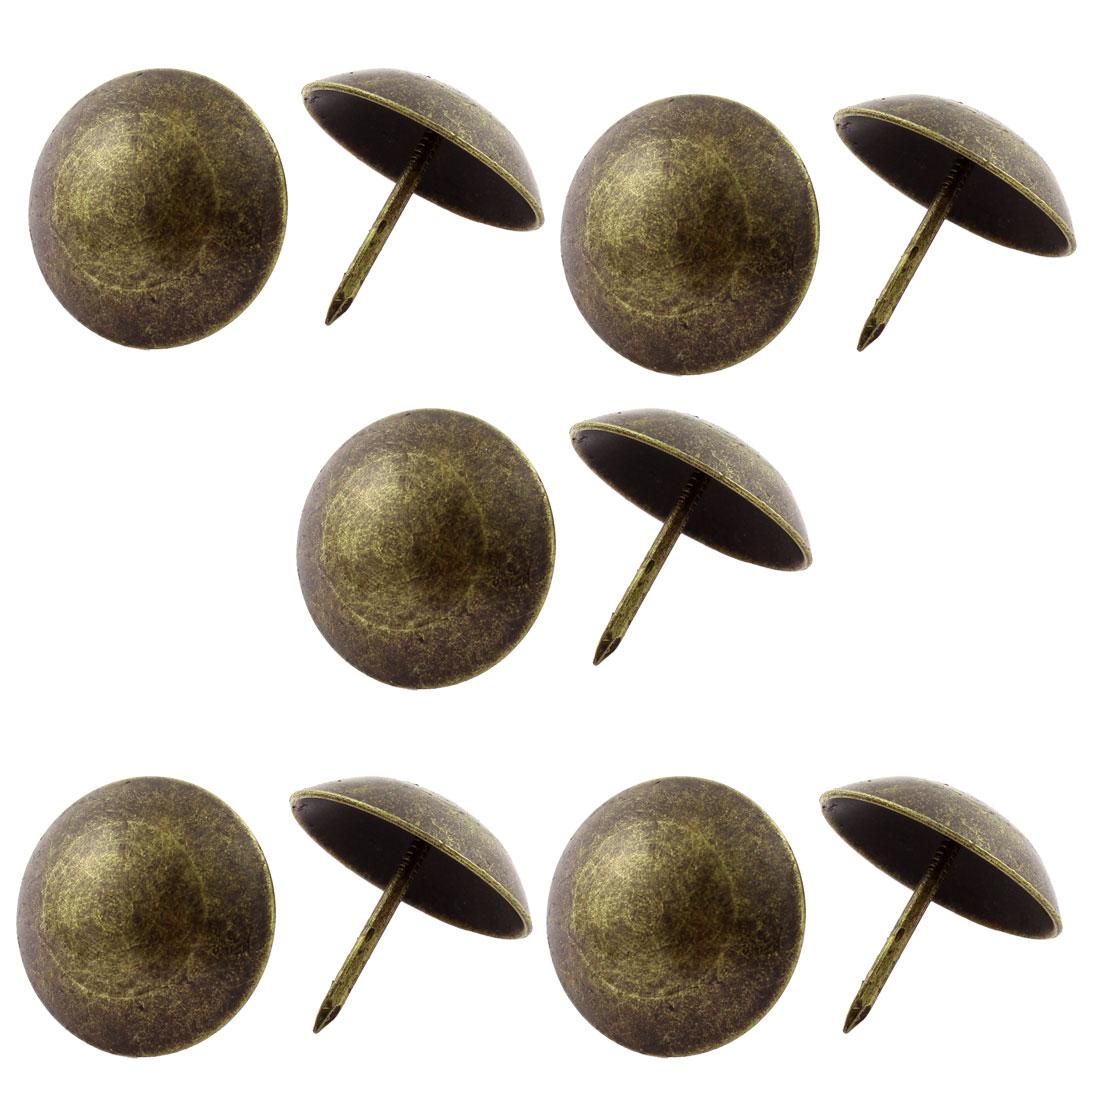 2cm Dia Metal Round Pin Furniture Decorative Domed Nail Bronze Tone 10Pcs